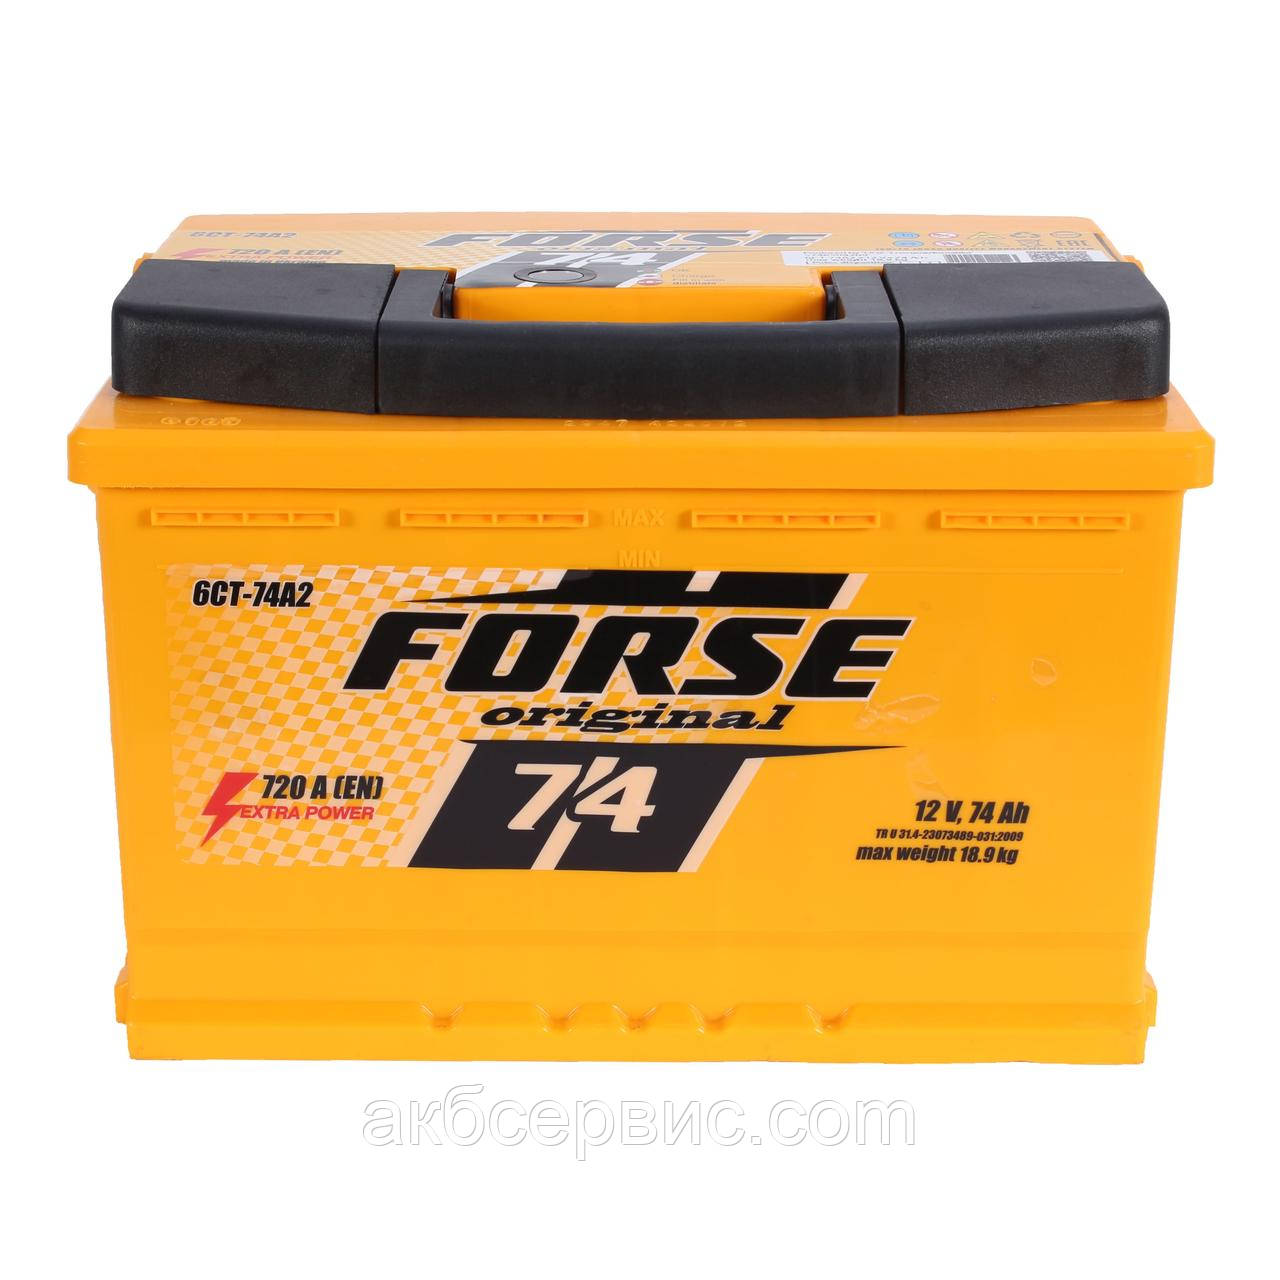 Аккумулятор автомобильный Forse 6СТ-74 АзЕ Original